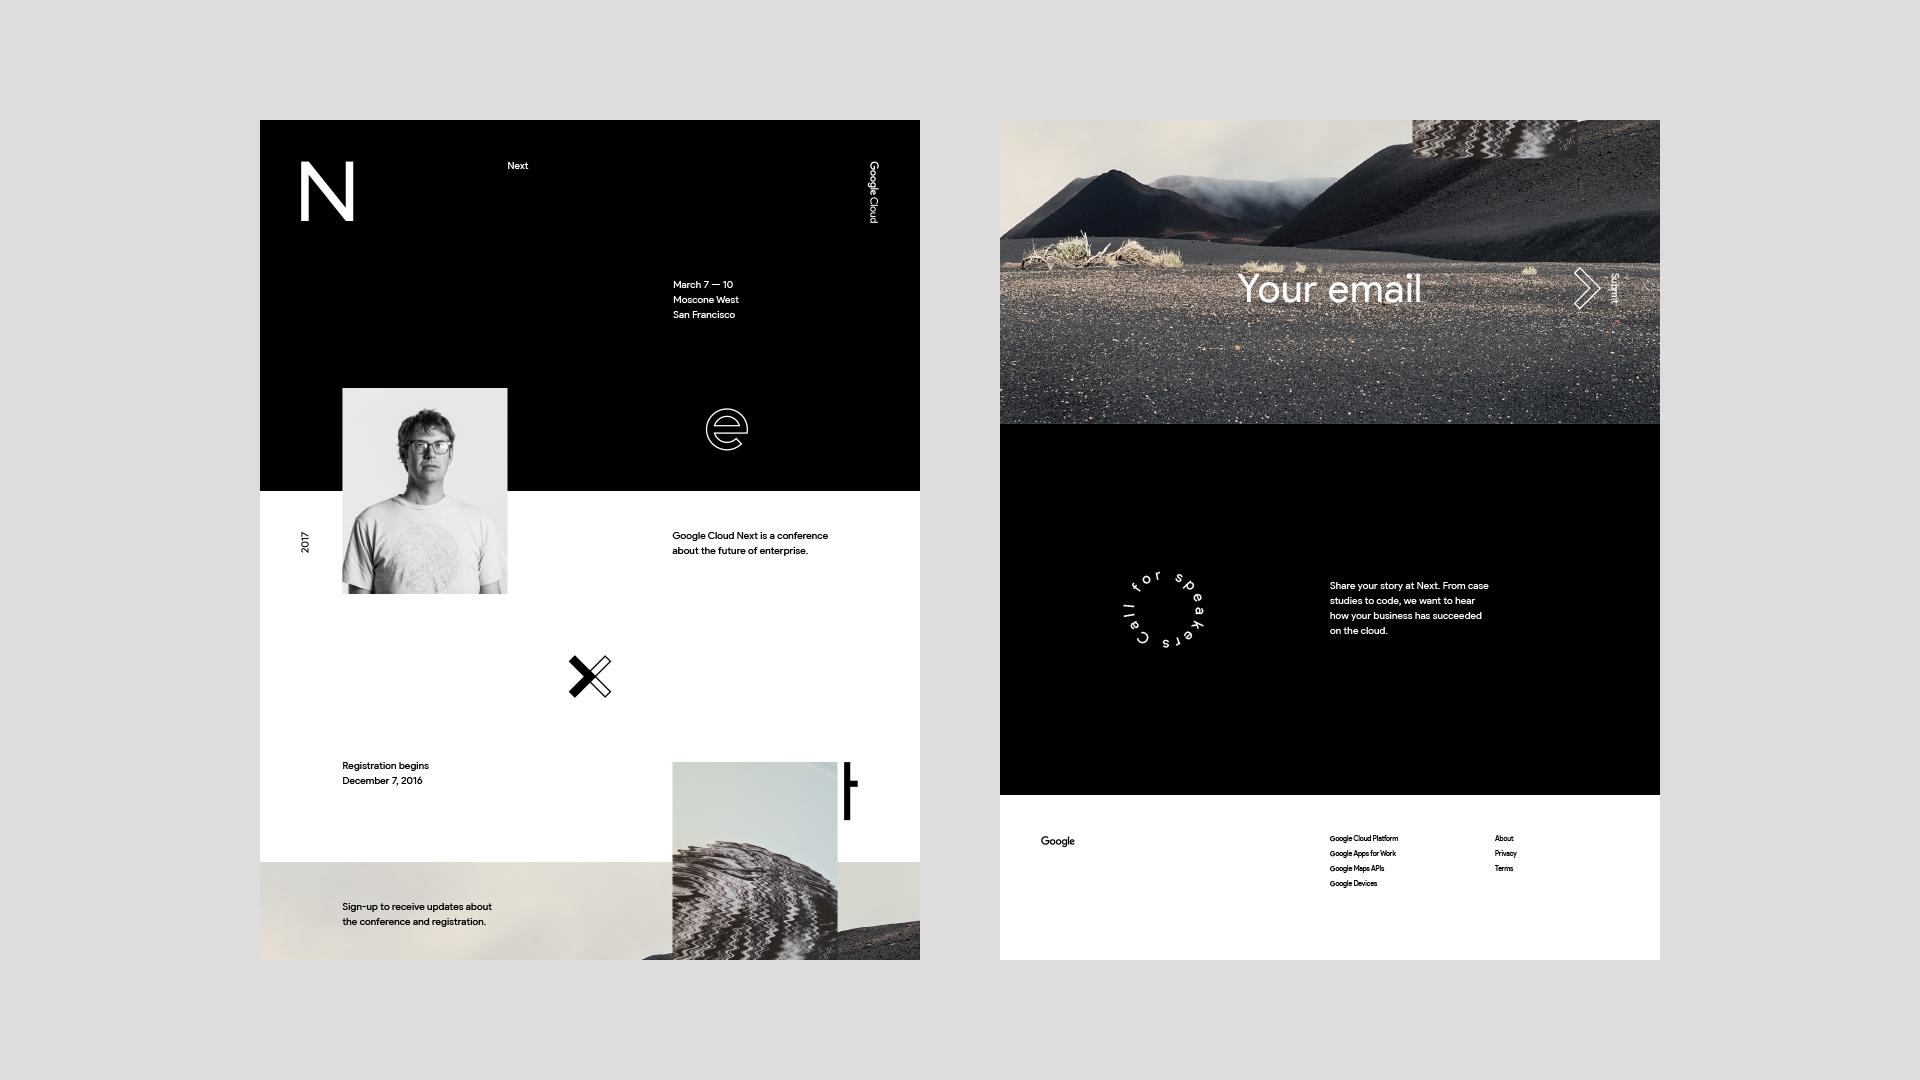 Next-web-06.jpg